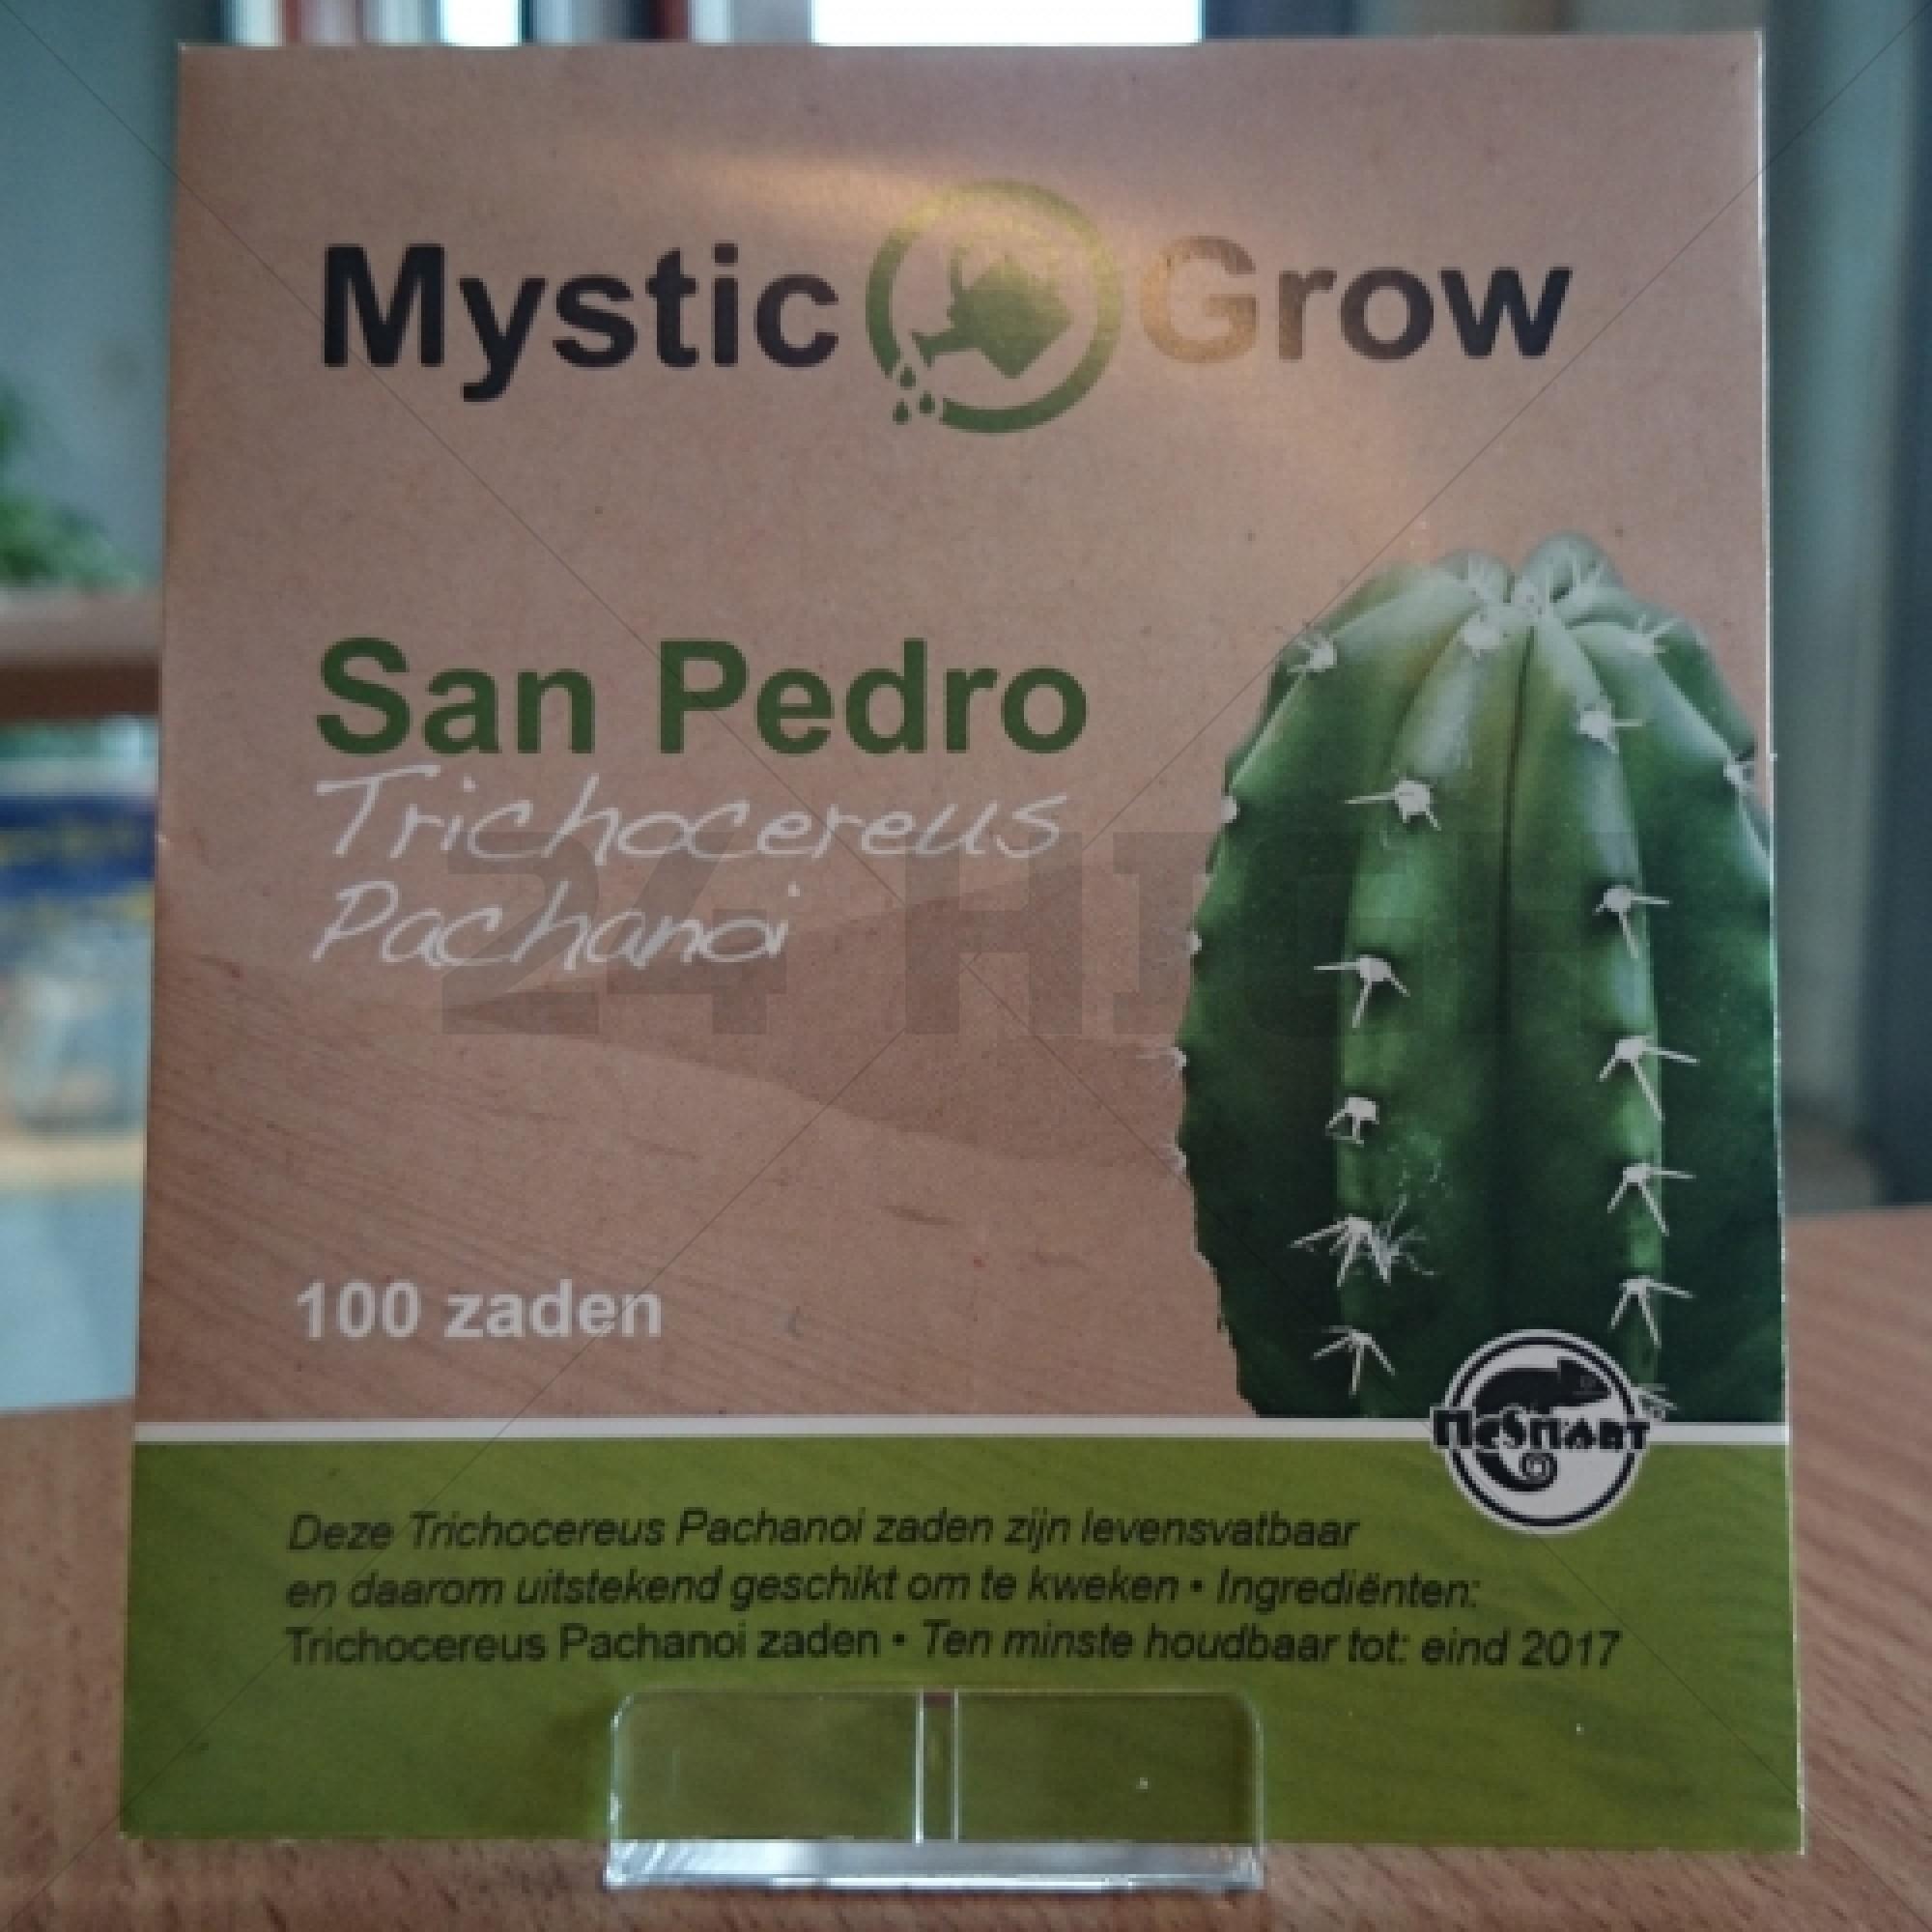 San Pedro seeds (Trichocereus Pachanoi)